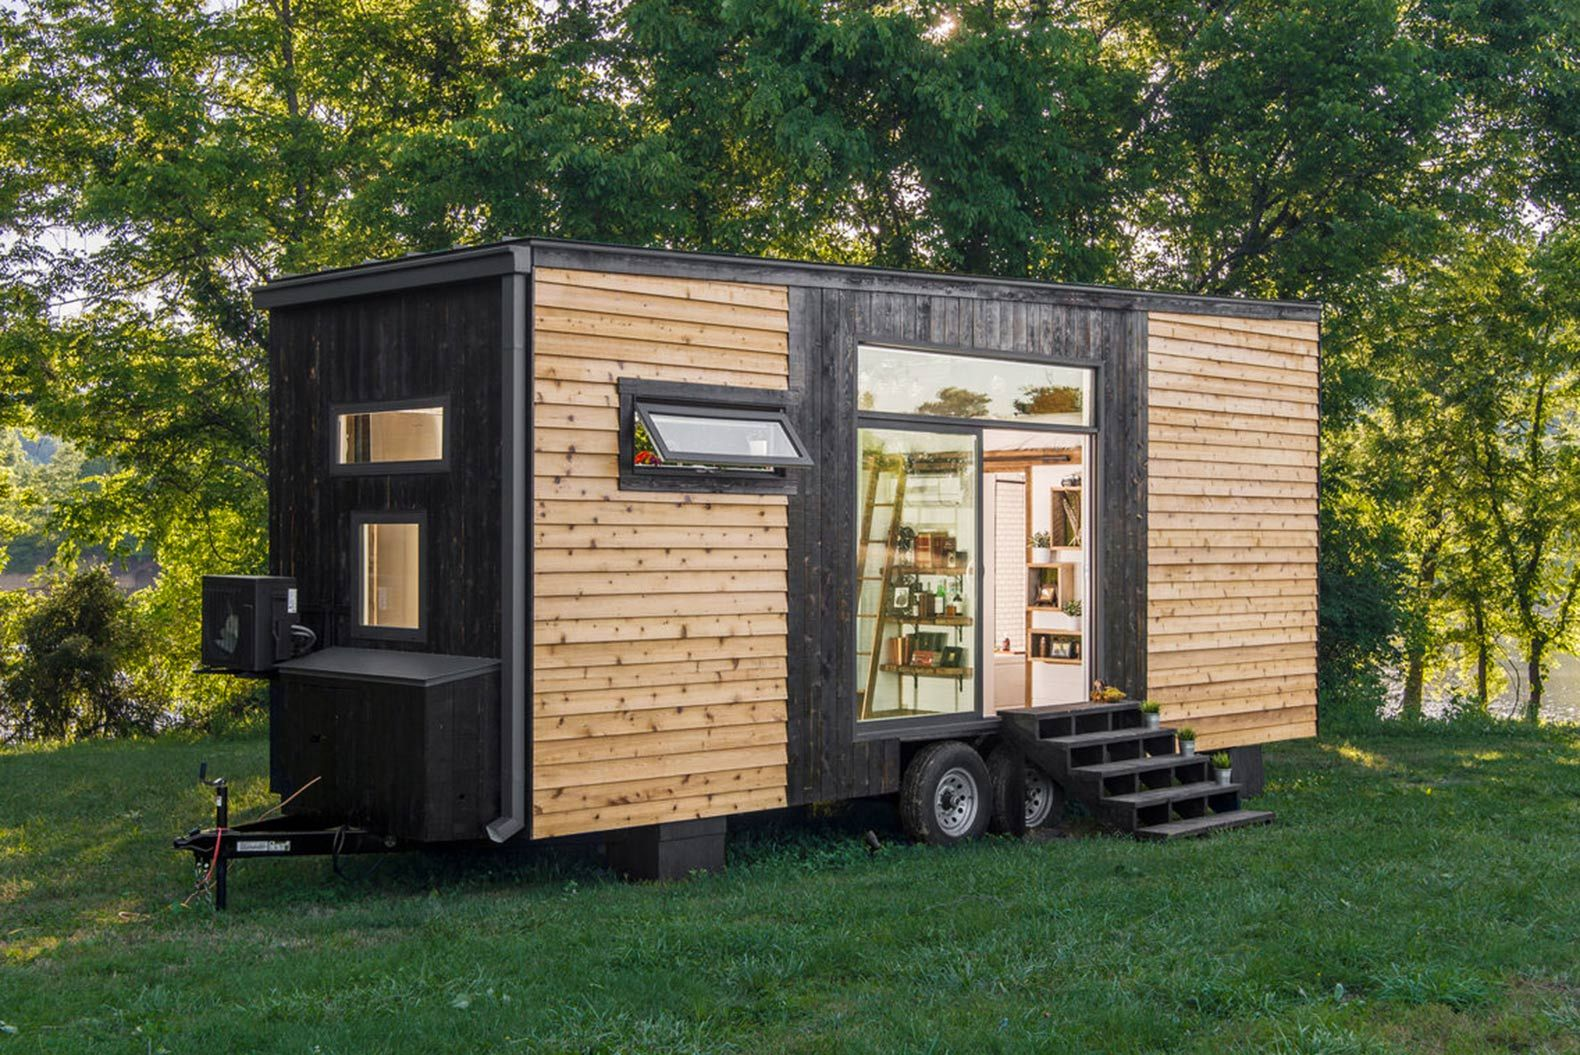 micro-homes-on-wheels-new-prefab-tiny-ho